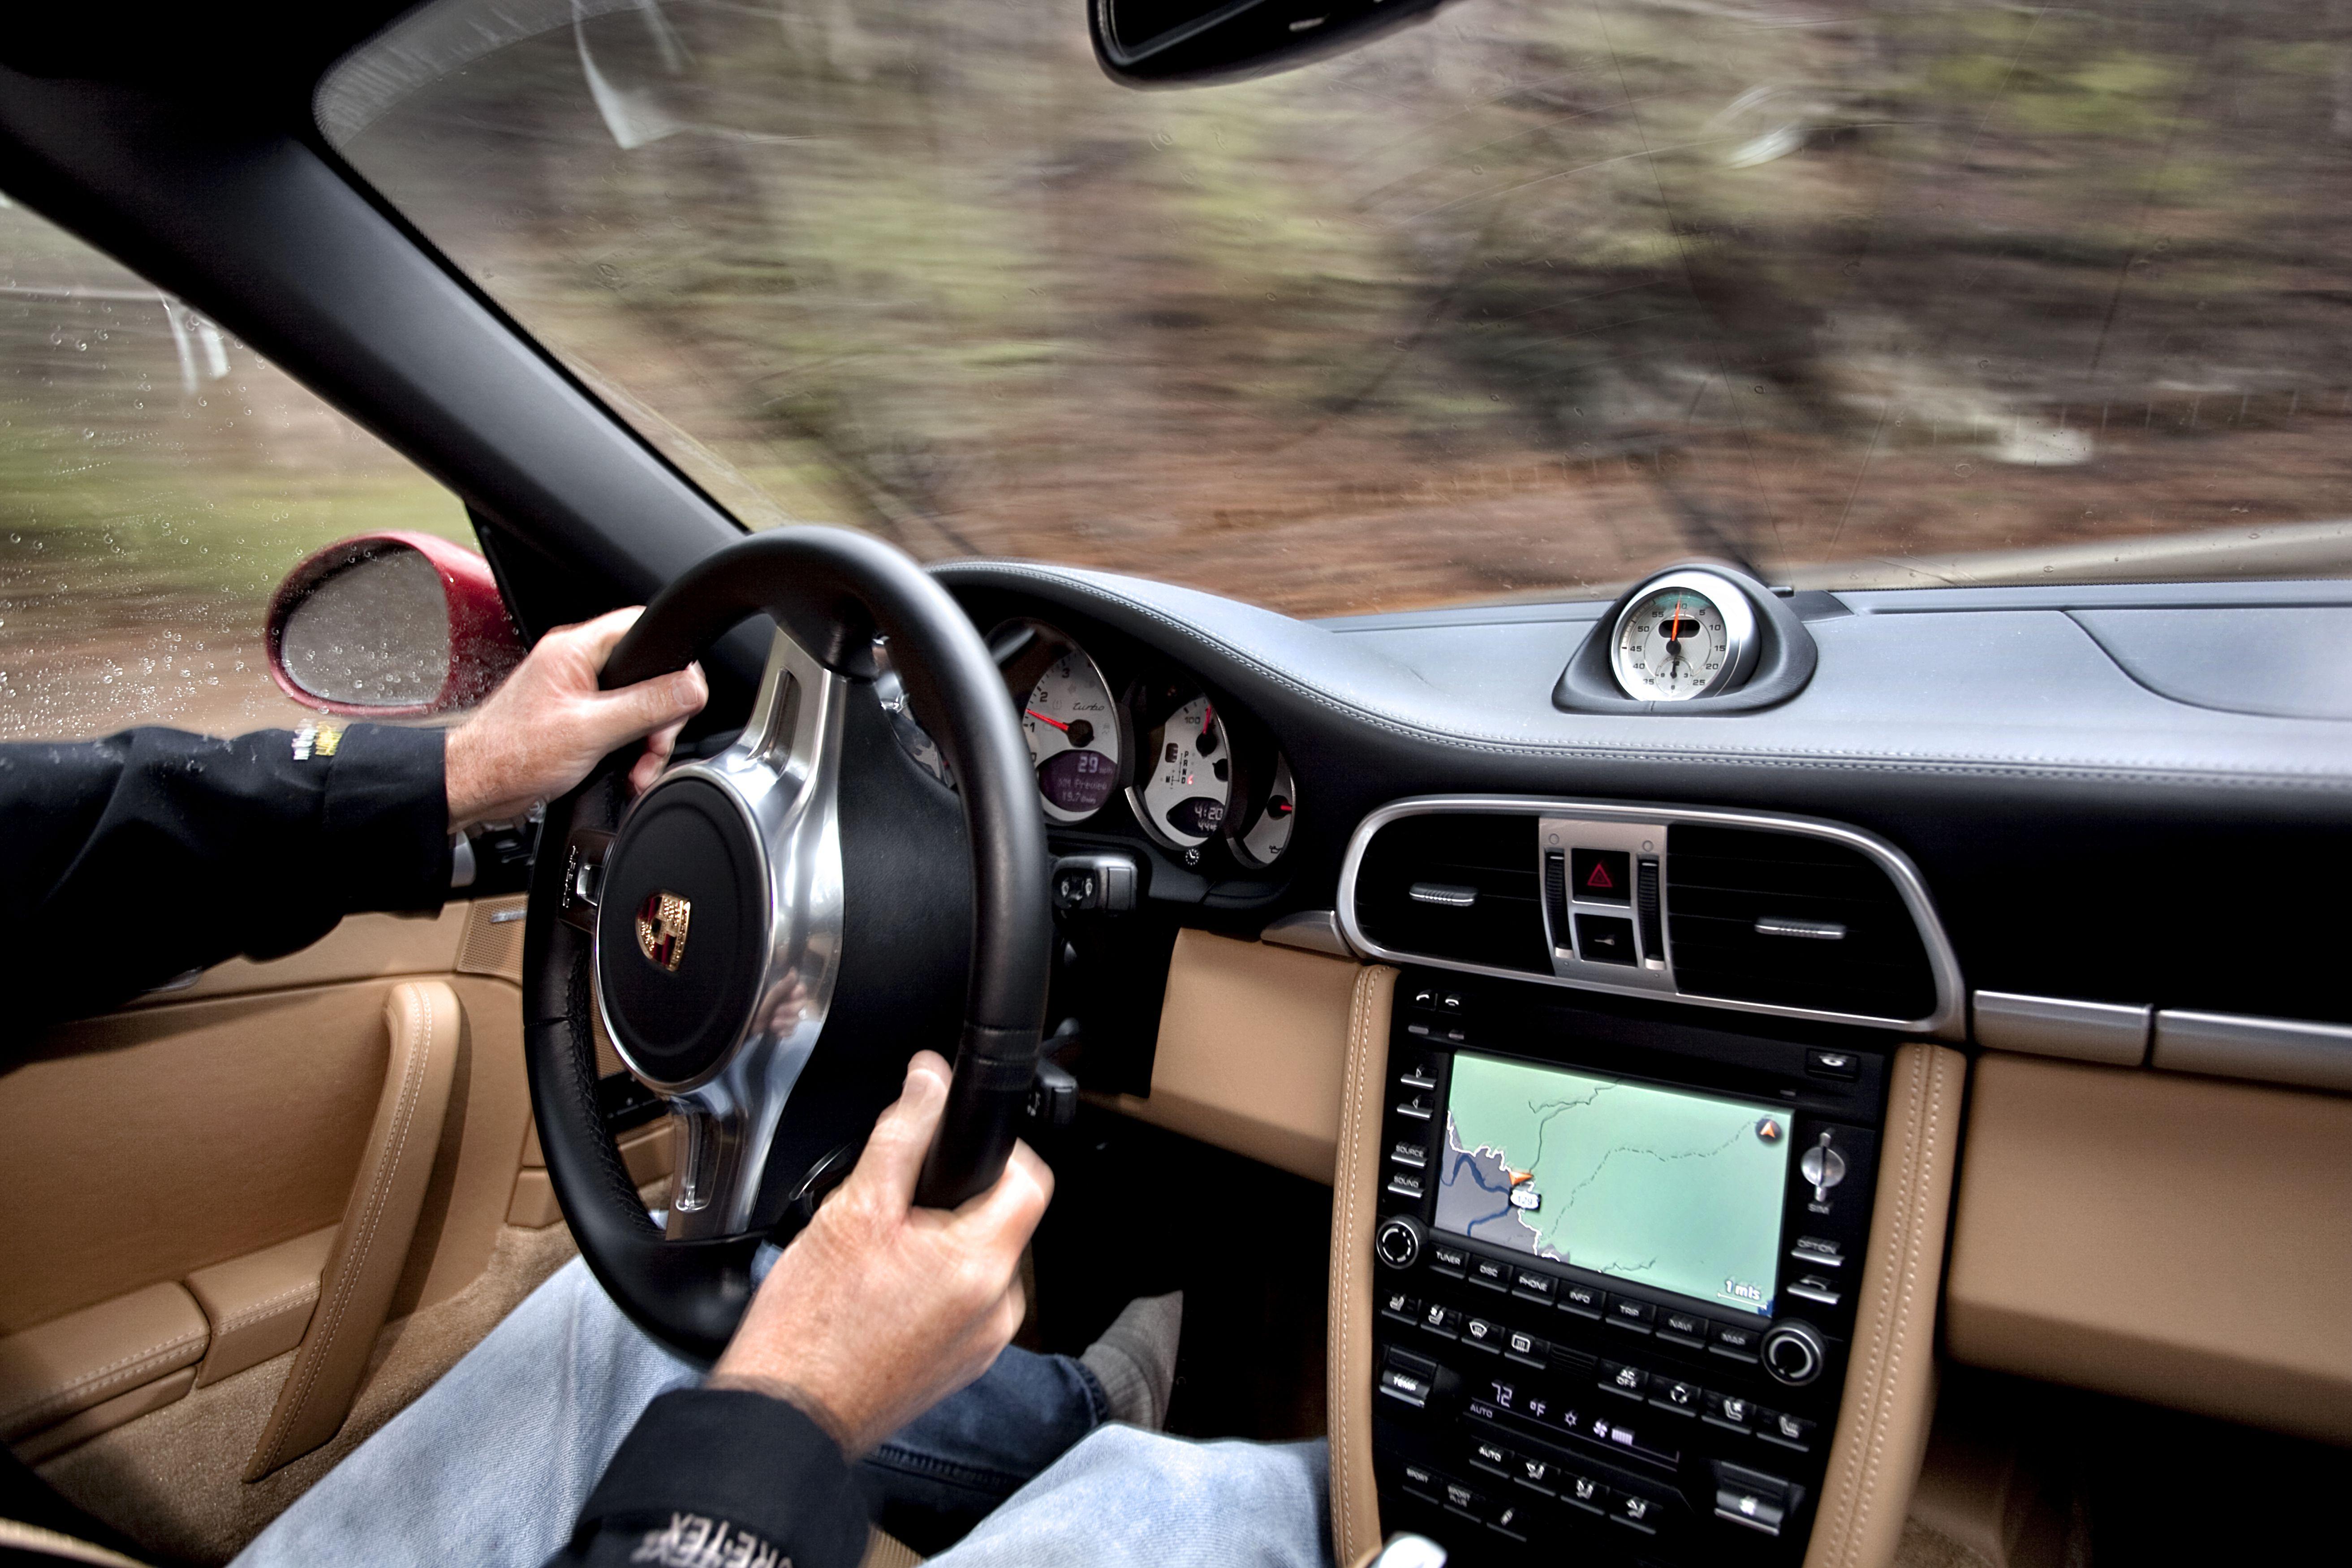 Man driving Porsche 911 Turbo